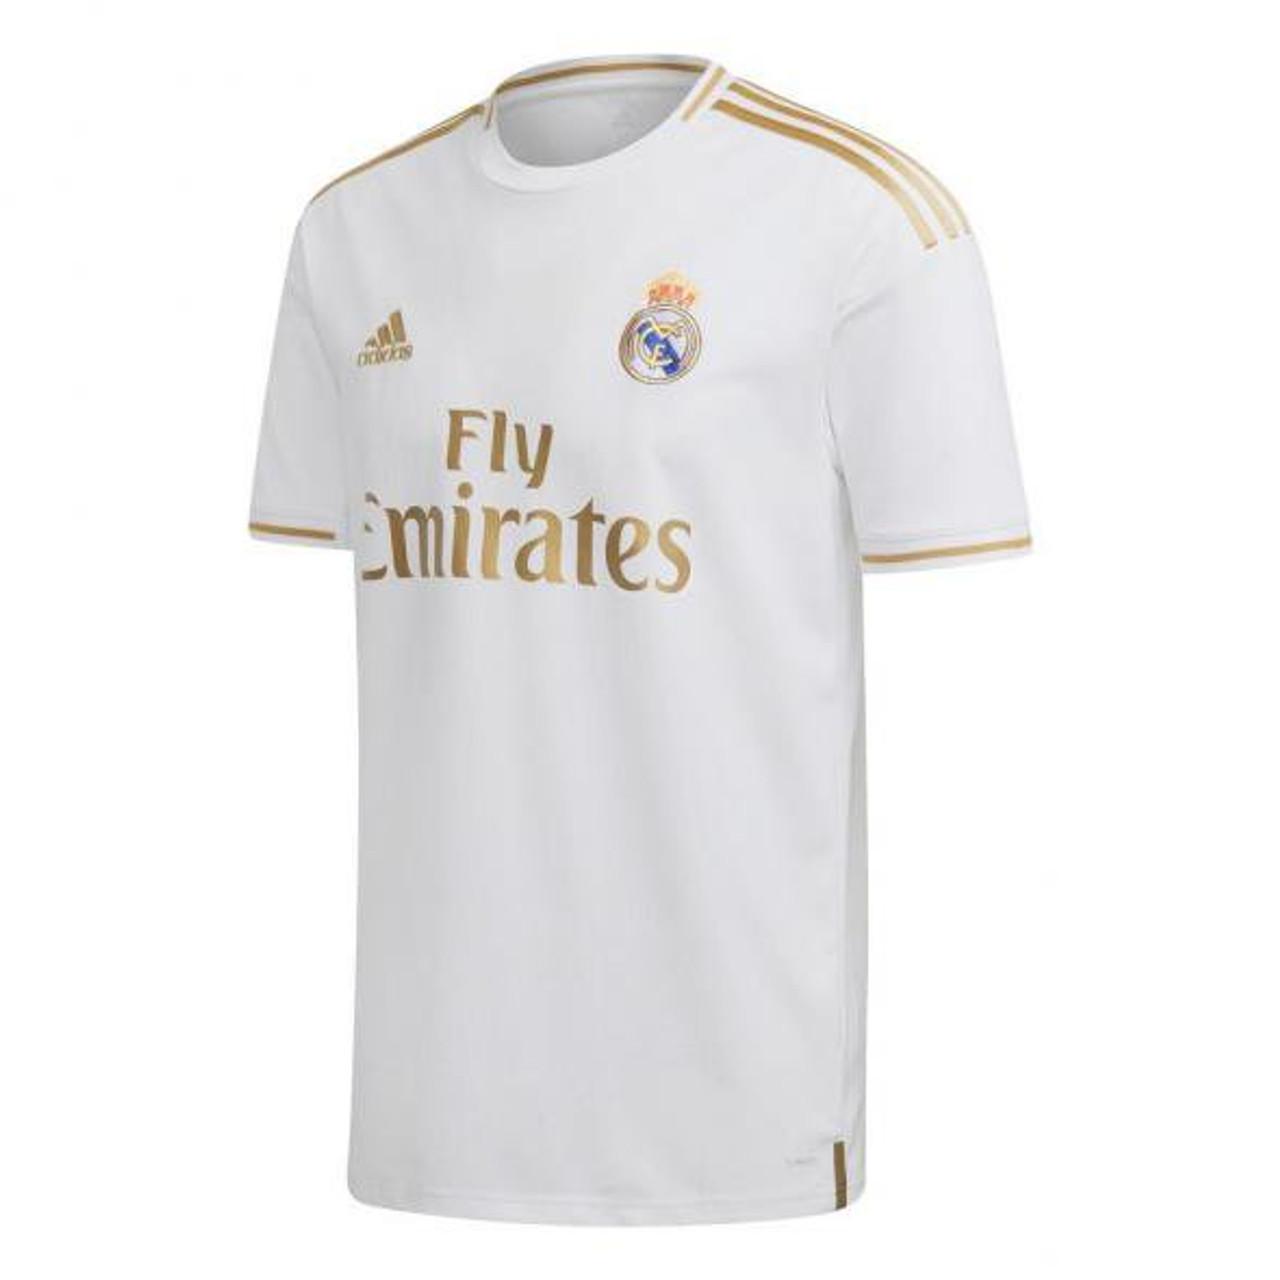 adidas Real Madrid 1920 Home Jersey Toni Kroos WhiteGold SD (123119)